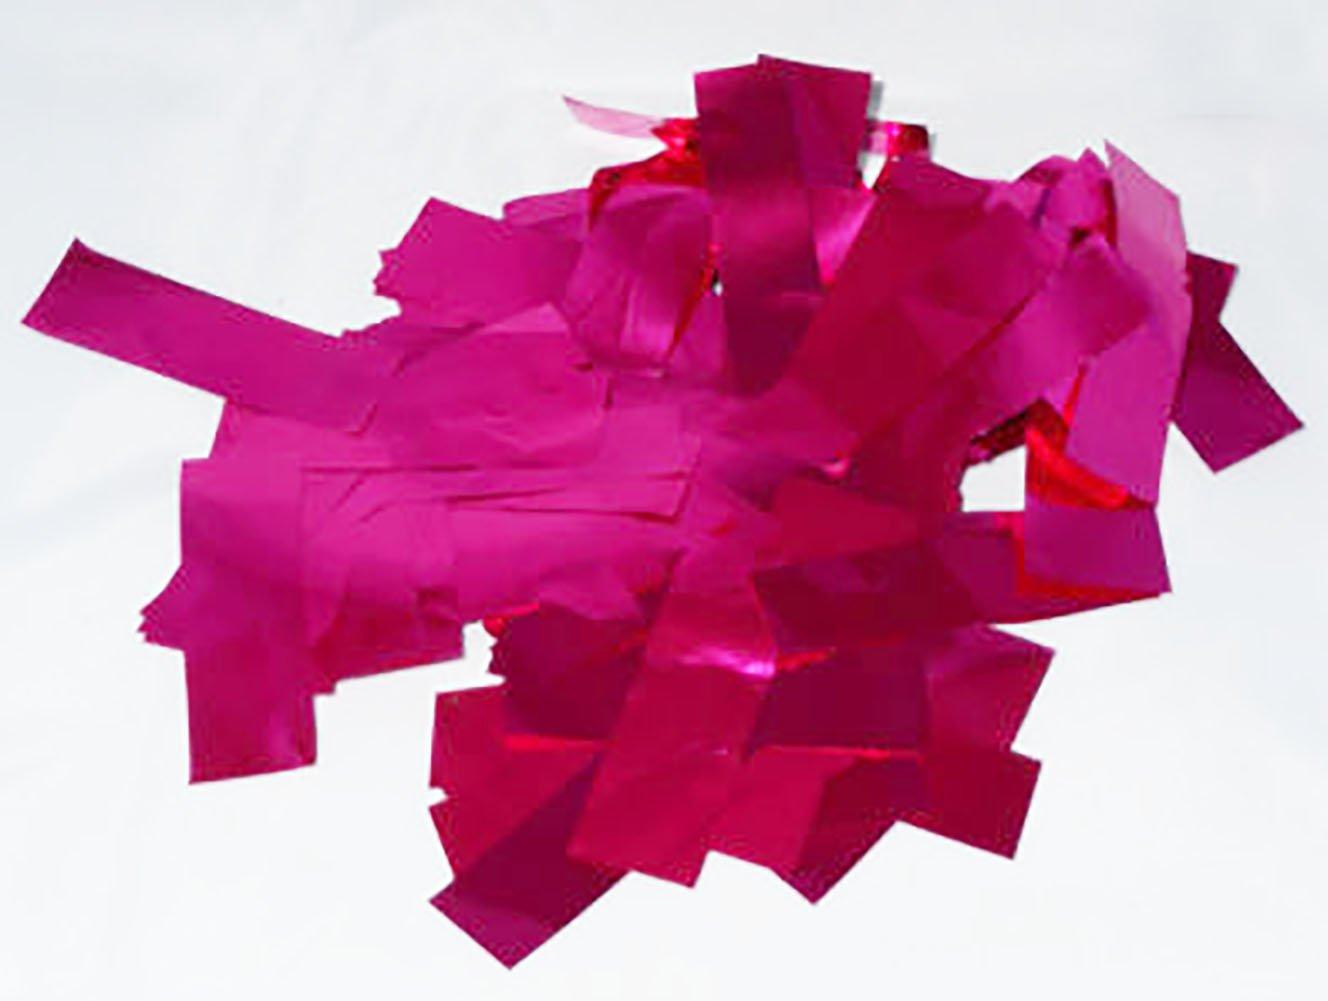 "Custom & Fancy {2.5'' x .75'' Inch} 1 Lb of Large Rectangle ""Throwing"" Party Confetti Made of Premium Metallic Foil w/ Elegant Vivid Beautiful Design [Fuchsia]"